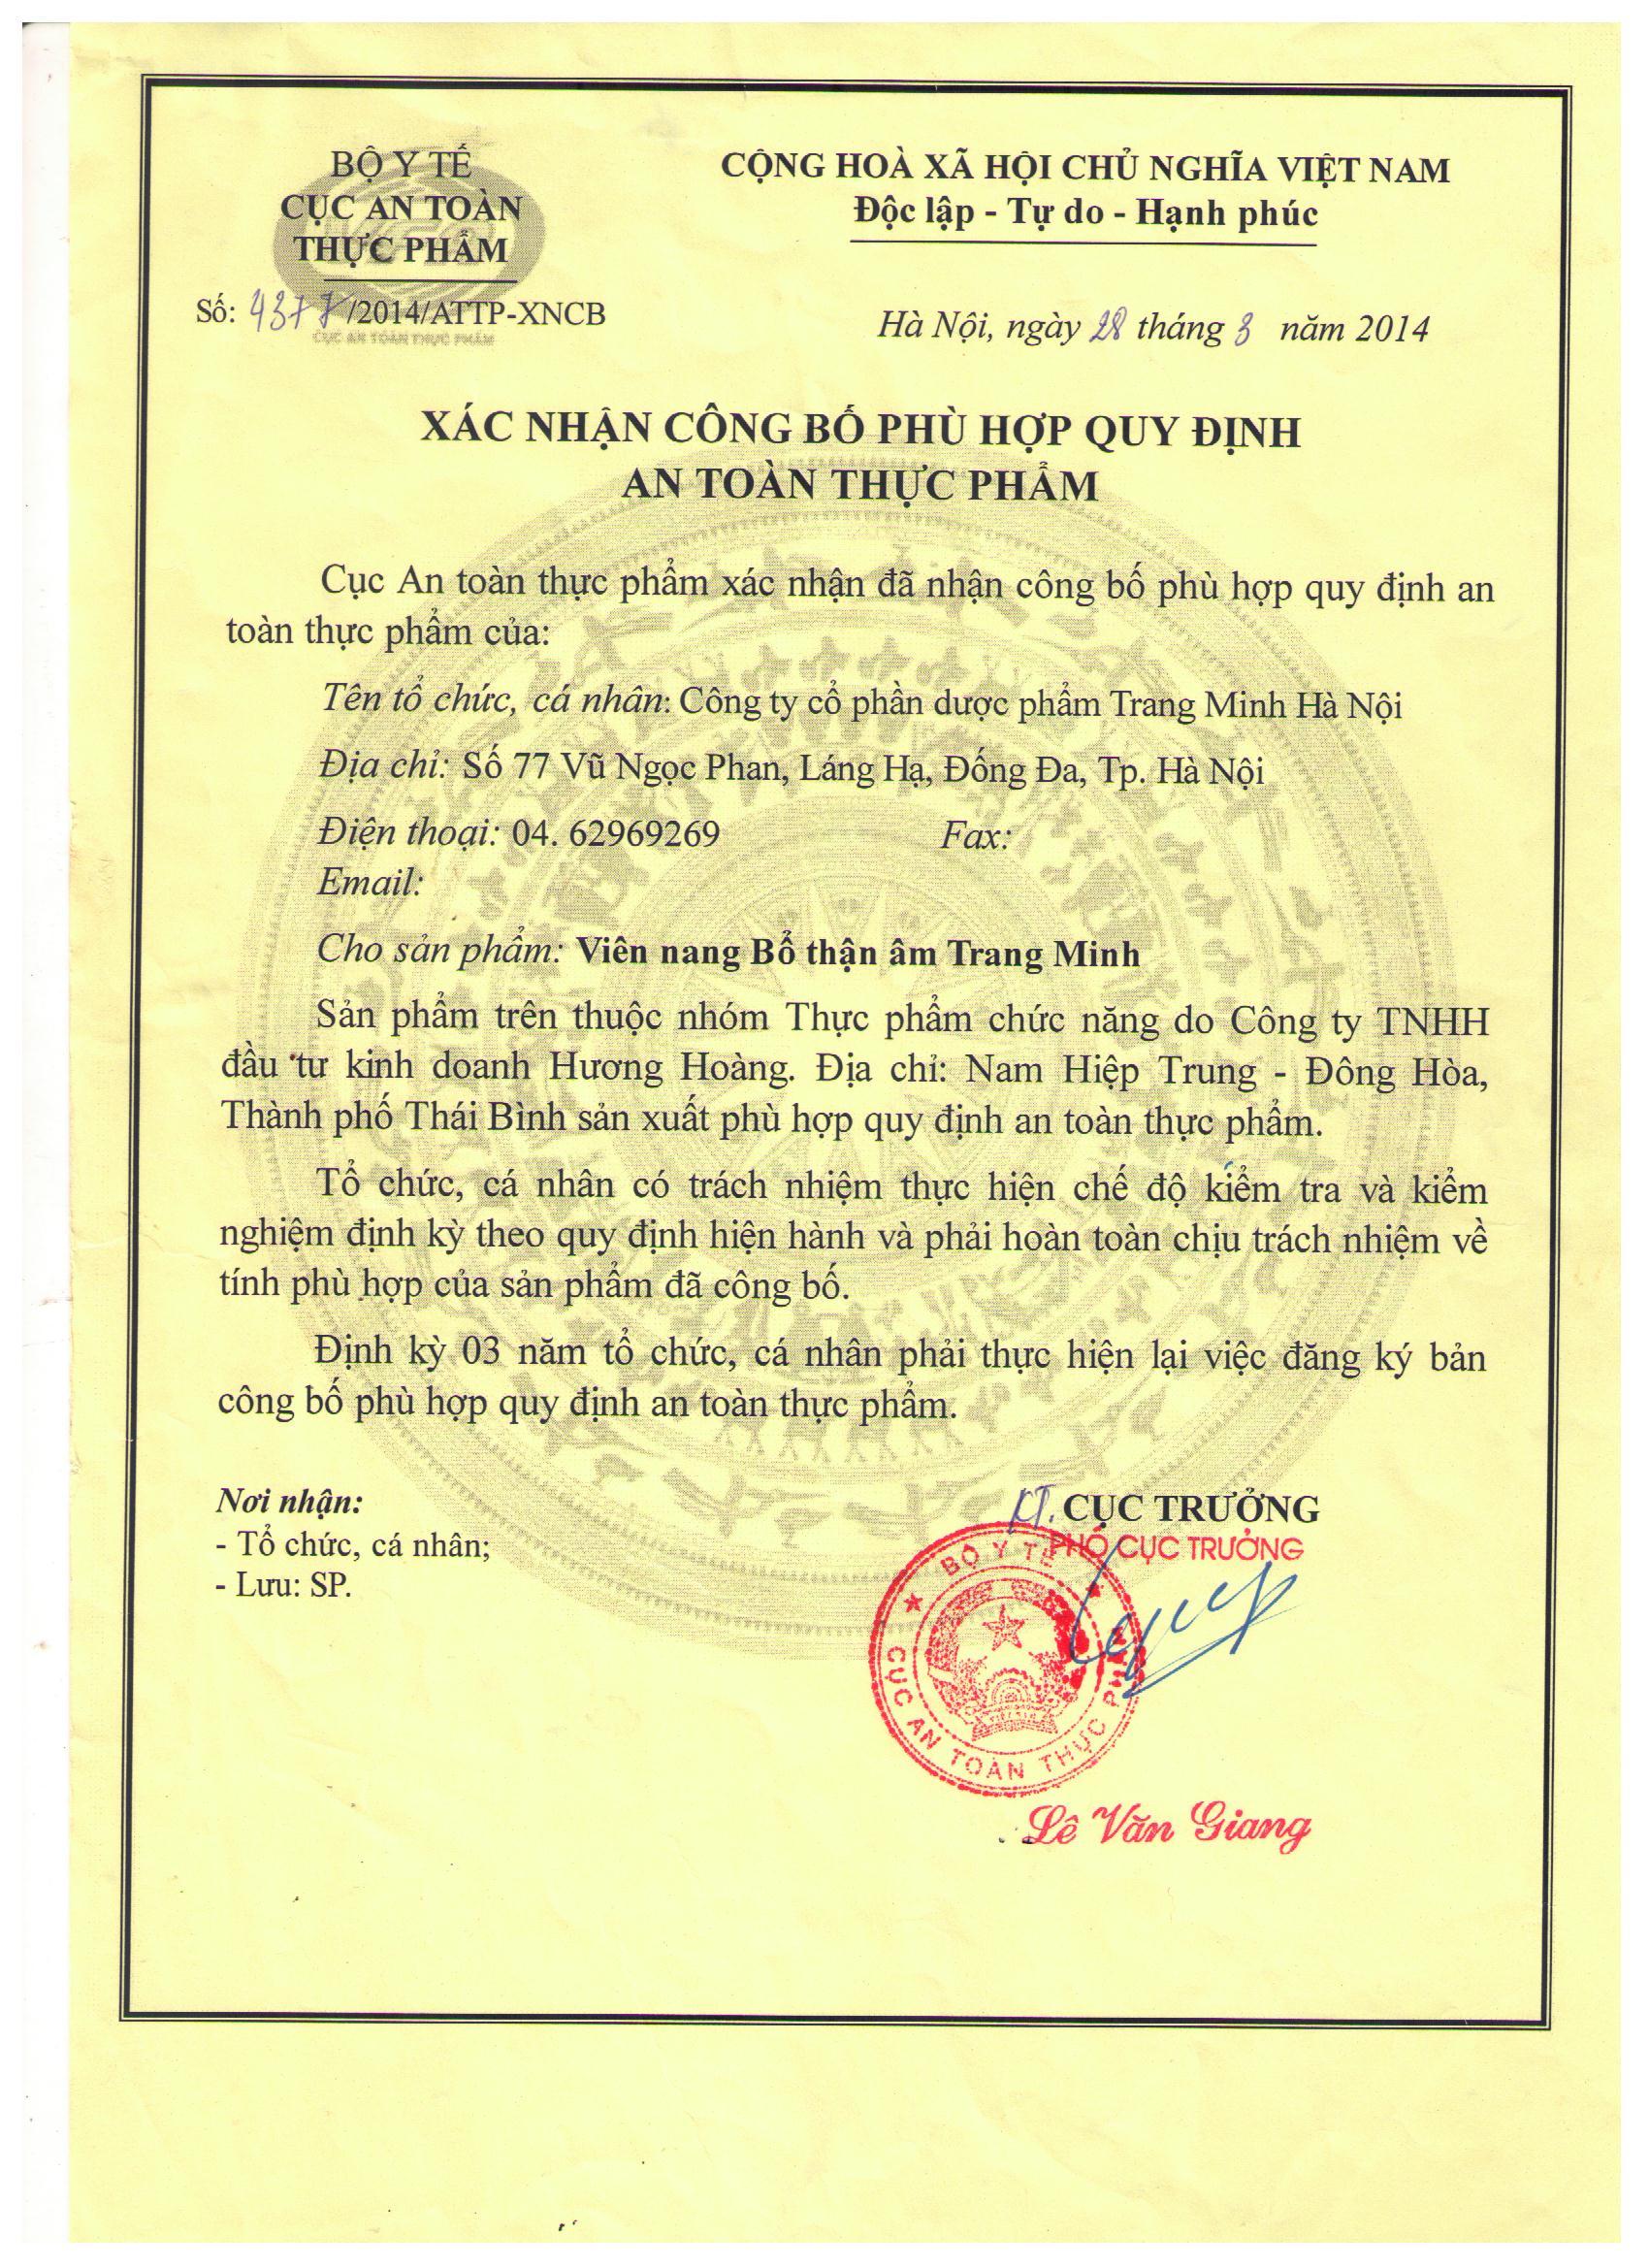 HN 14.3.28 Vien nang Bo than am Trang Minh